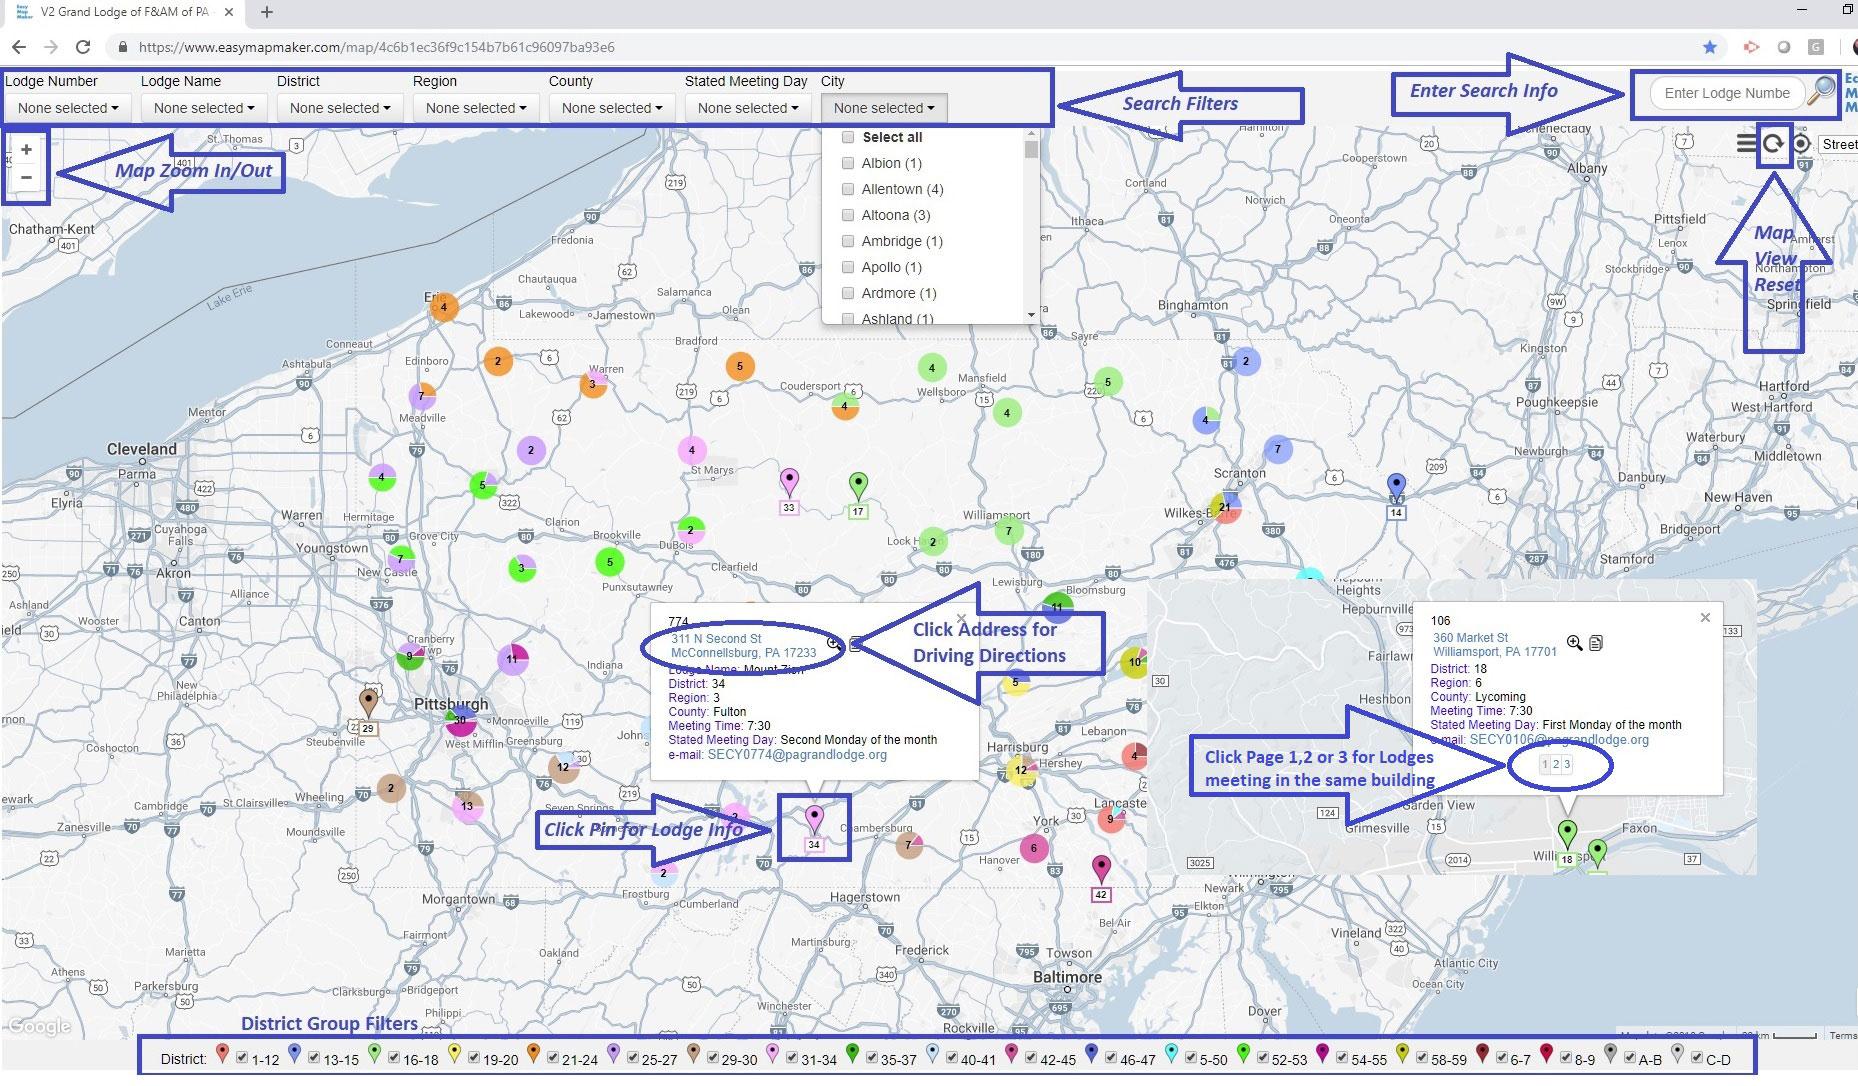 PA Lodge Locator Reference Image